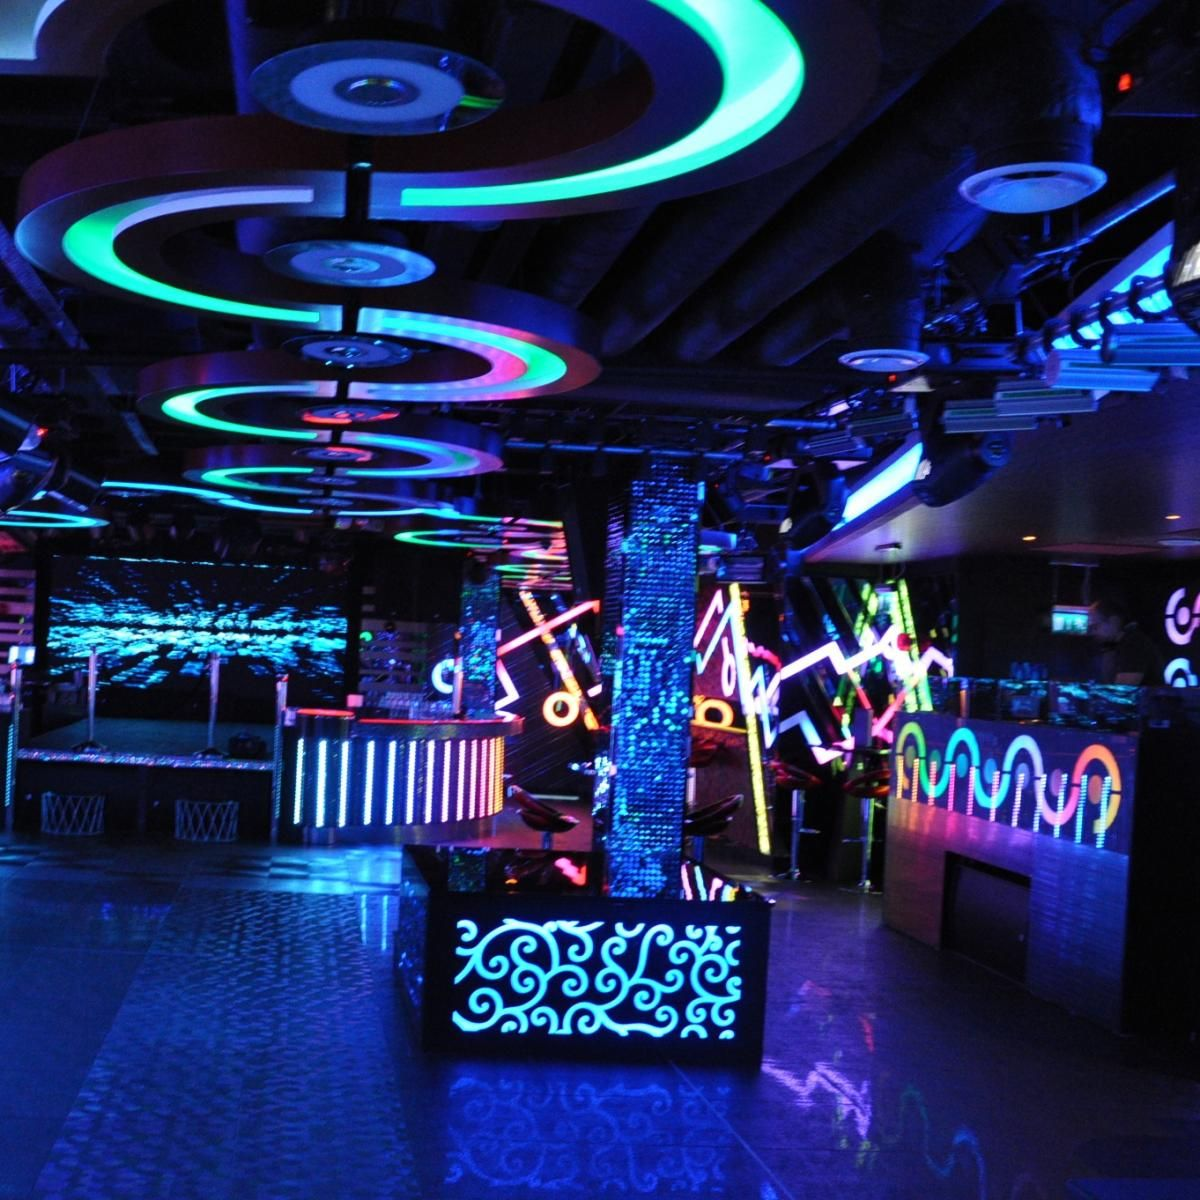 Karaoke bar design nemo nyc the best bkaraokeb lounge with karaoke bar design nemo nyc the best bkaraokeb lounge with full bbarb korean pinterest karaoke and bar malvernweather Image collections